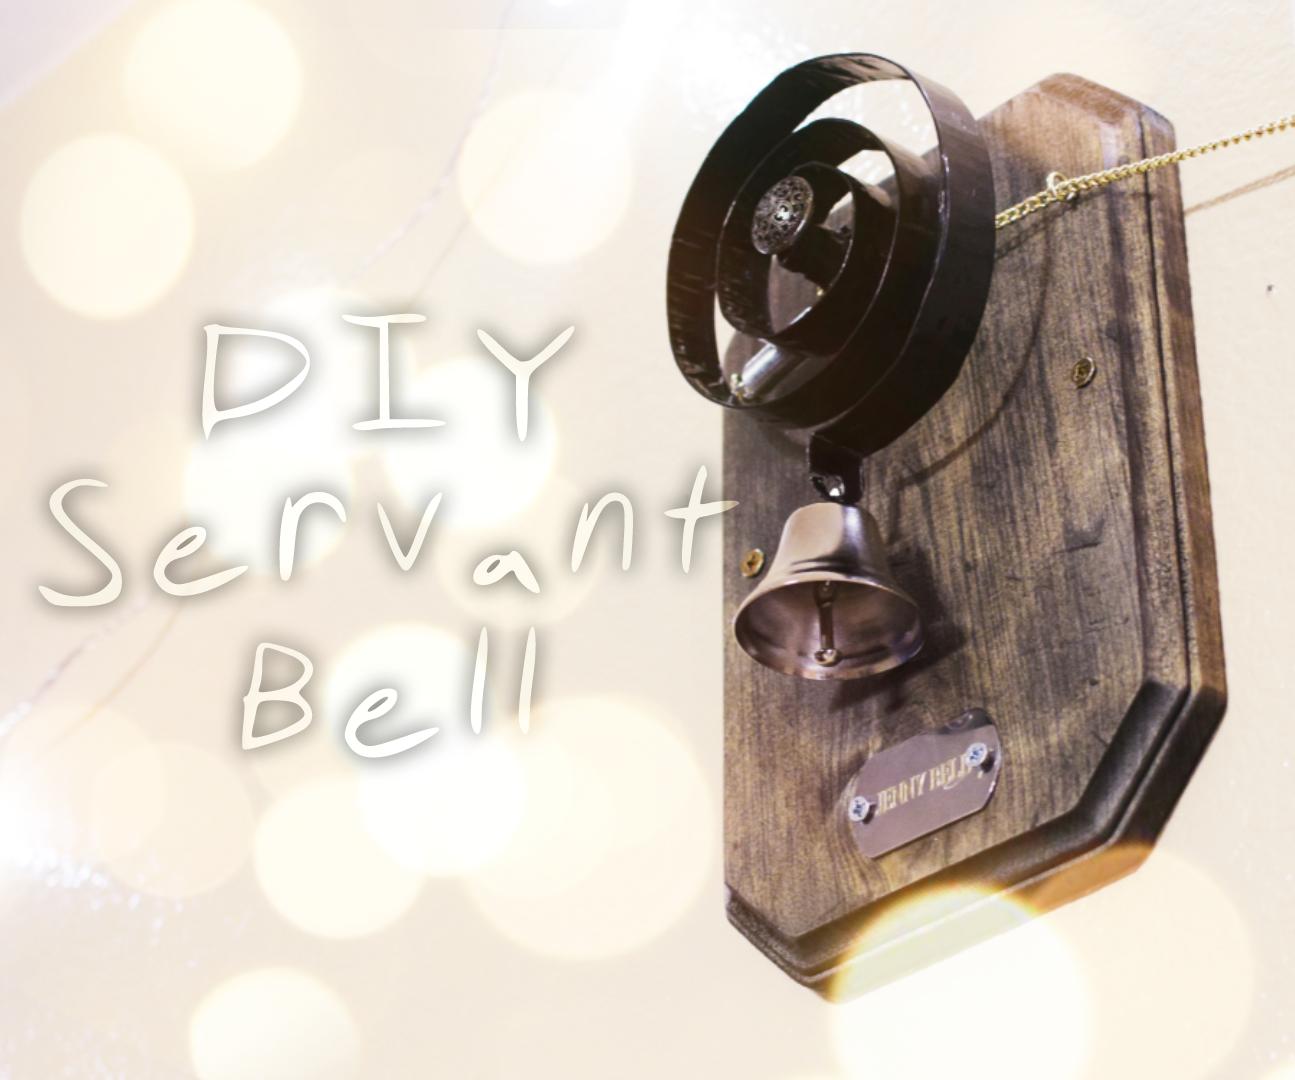 Downton Abbey Servant Bell